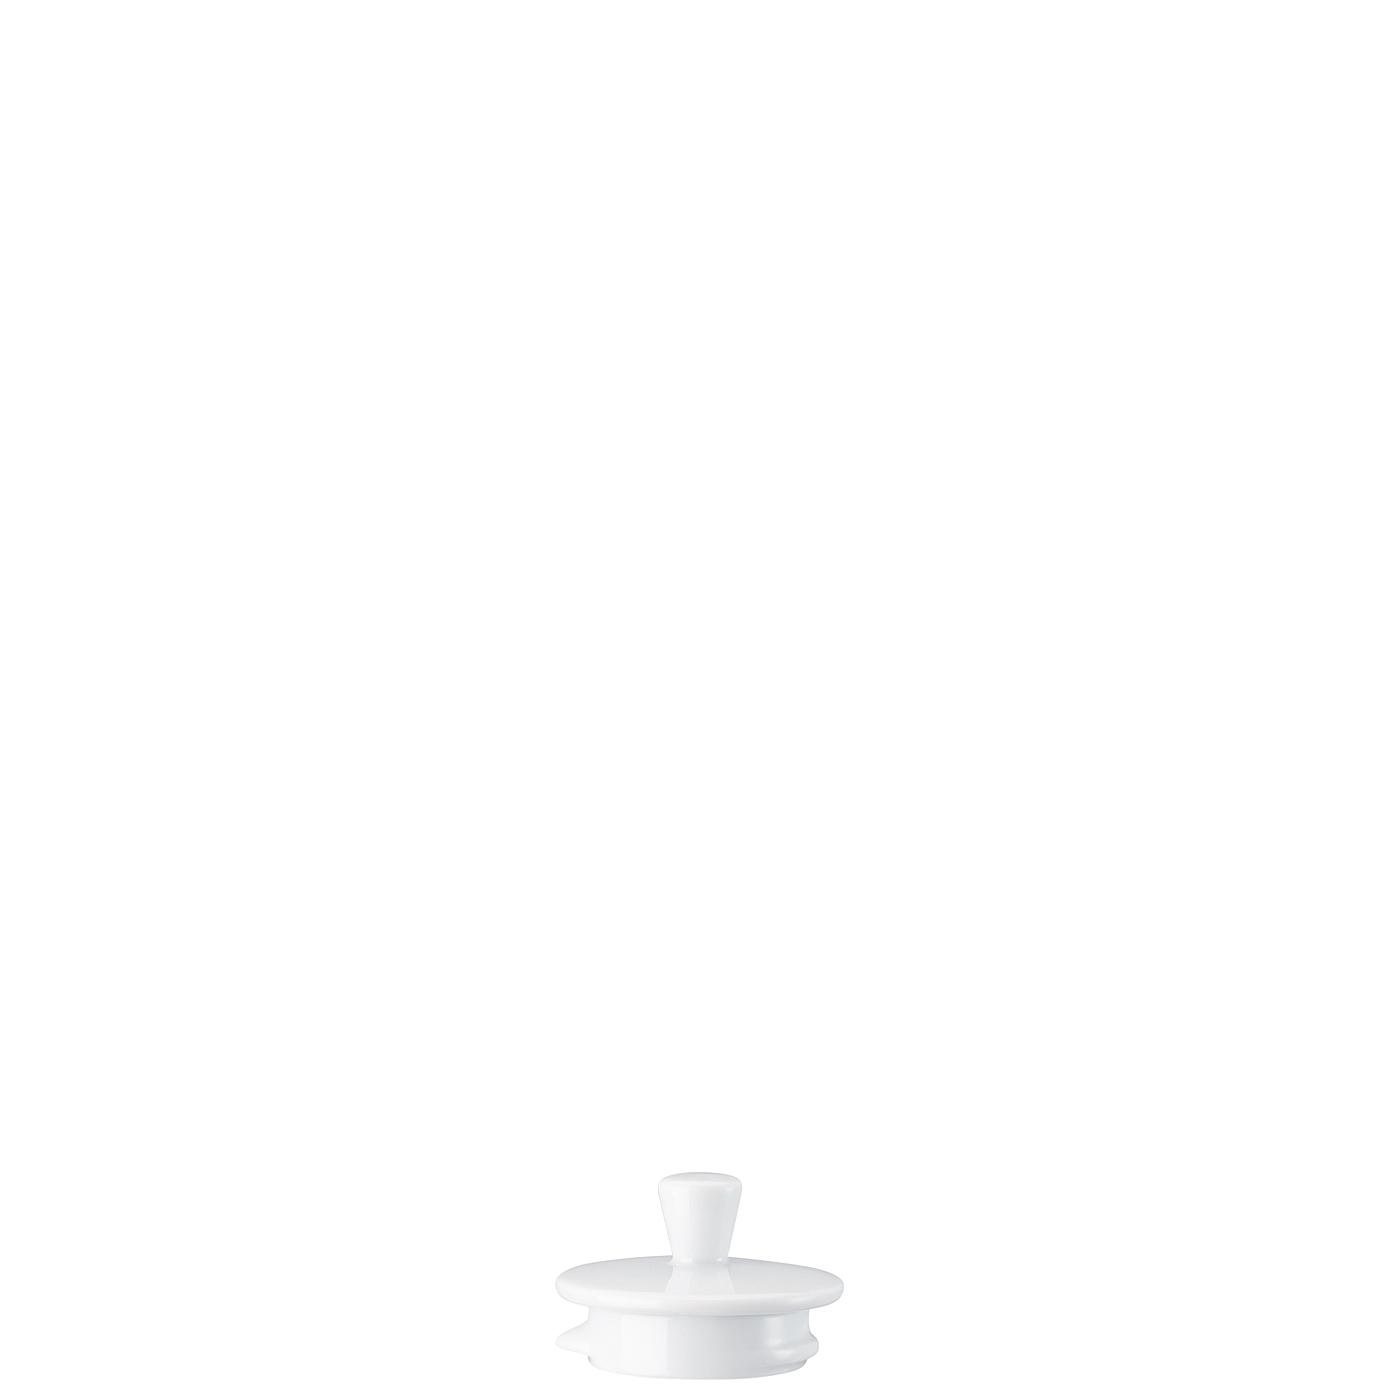 Kaffeekanne 2 P. Deckel Form 1382 Weiss Arzberg